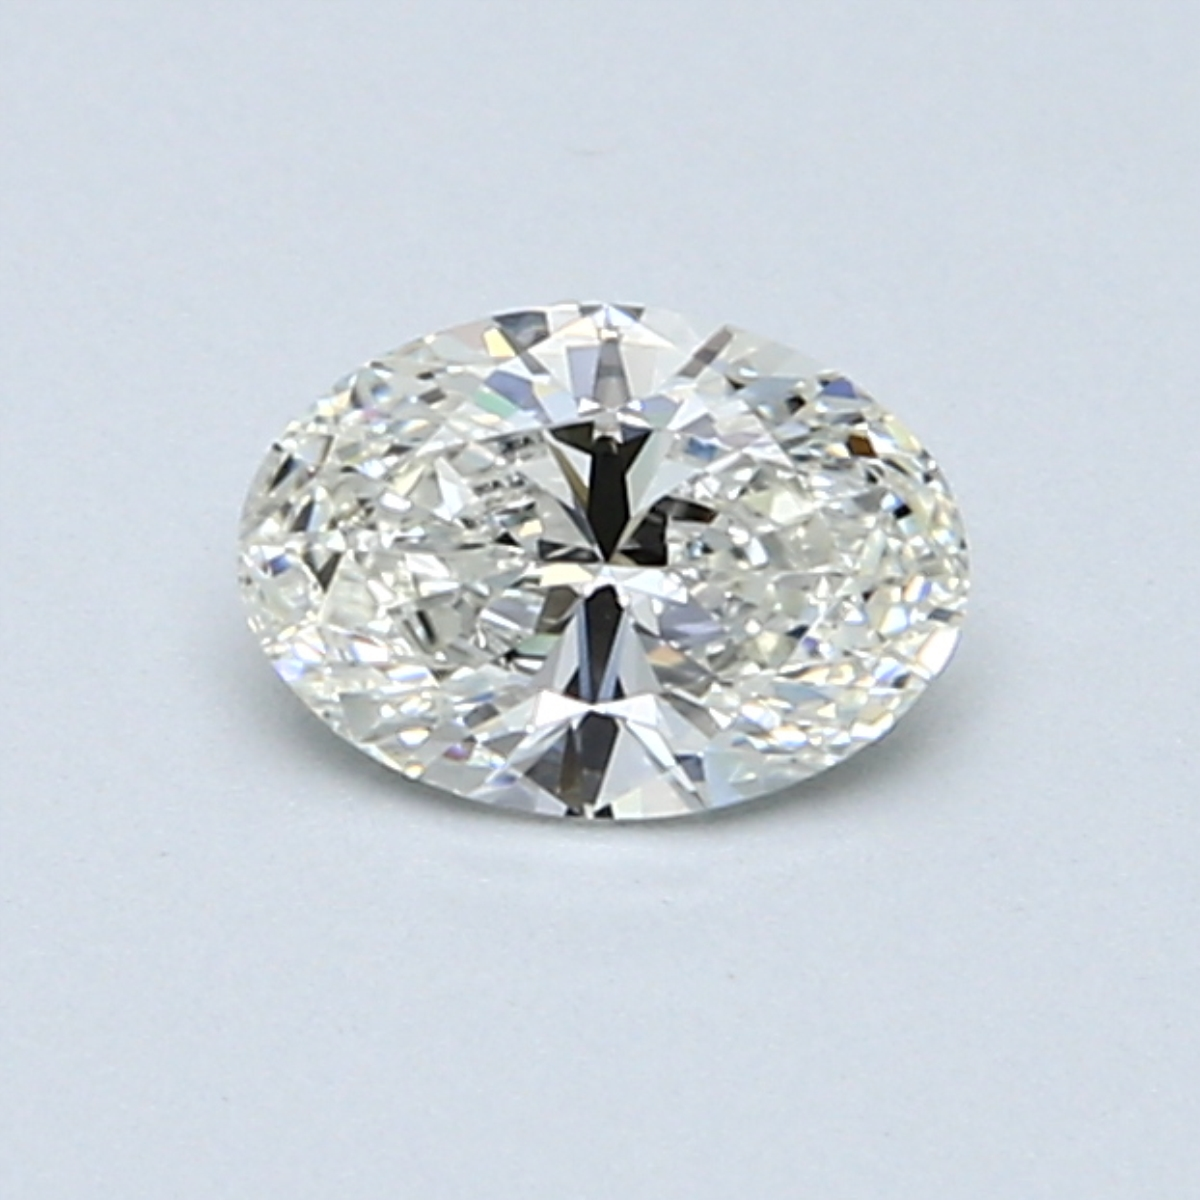 0.51 Carat I VS1 Oval Diamond